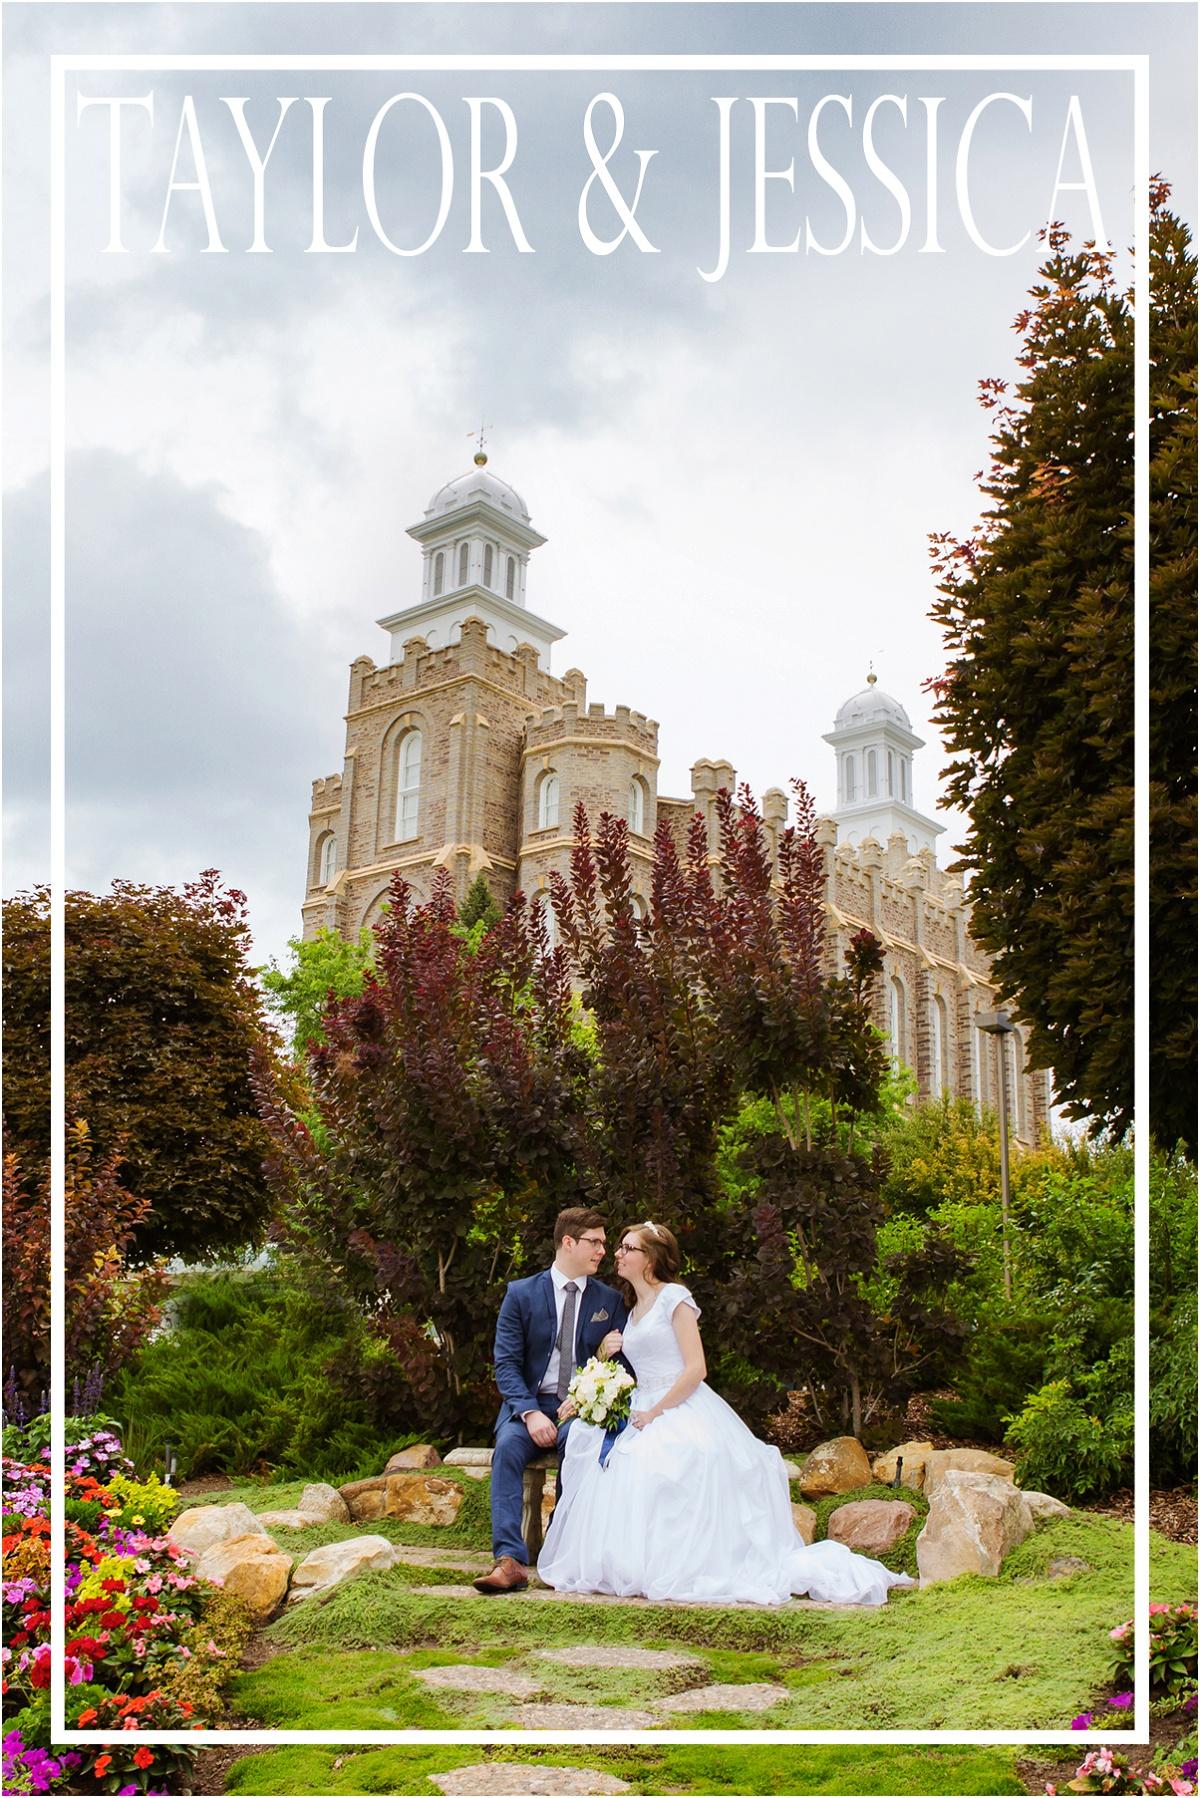 Terra Cooper Photography Weddings Brides 2015_5394.jpg